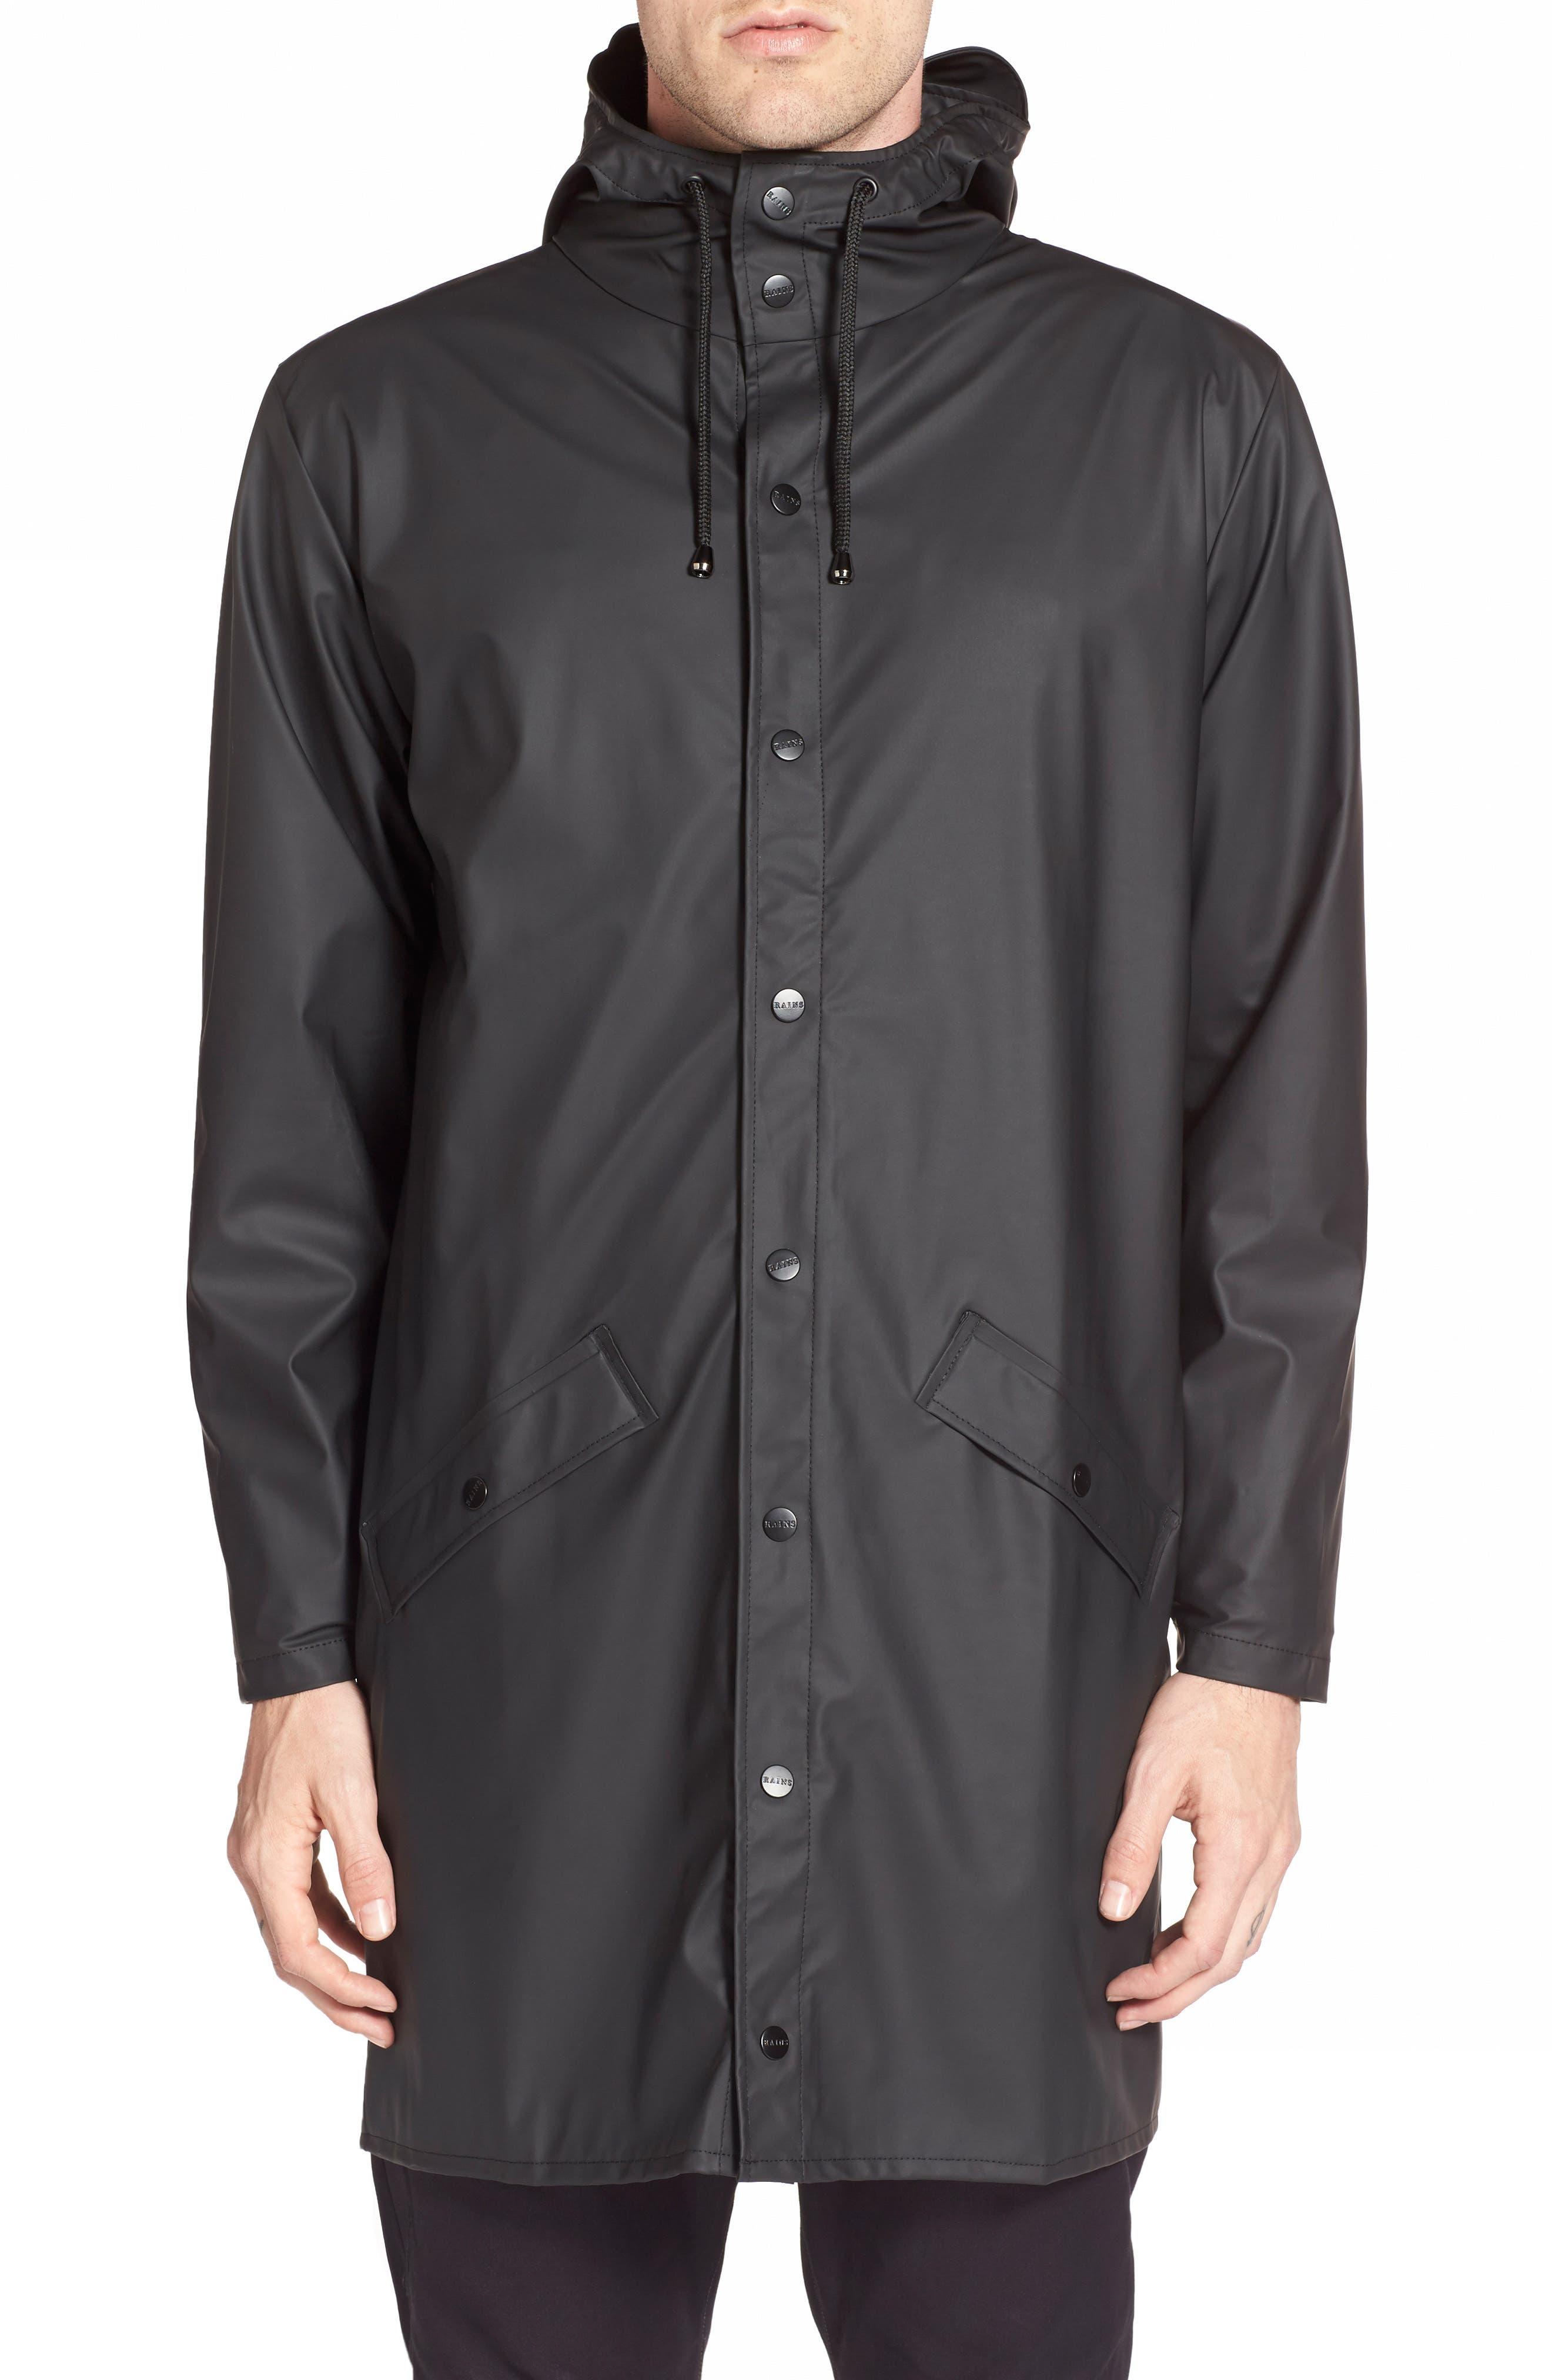 RAINS Waterproof Hooded Long Rain Jacket, Main, color, BLACK